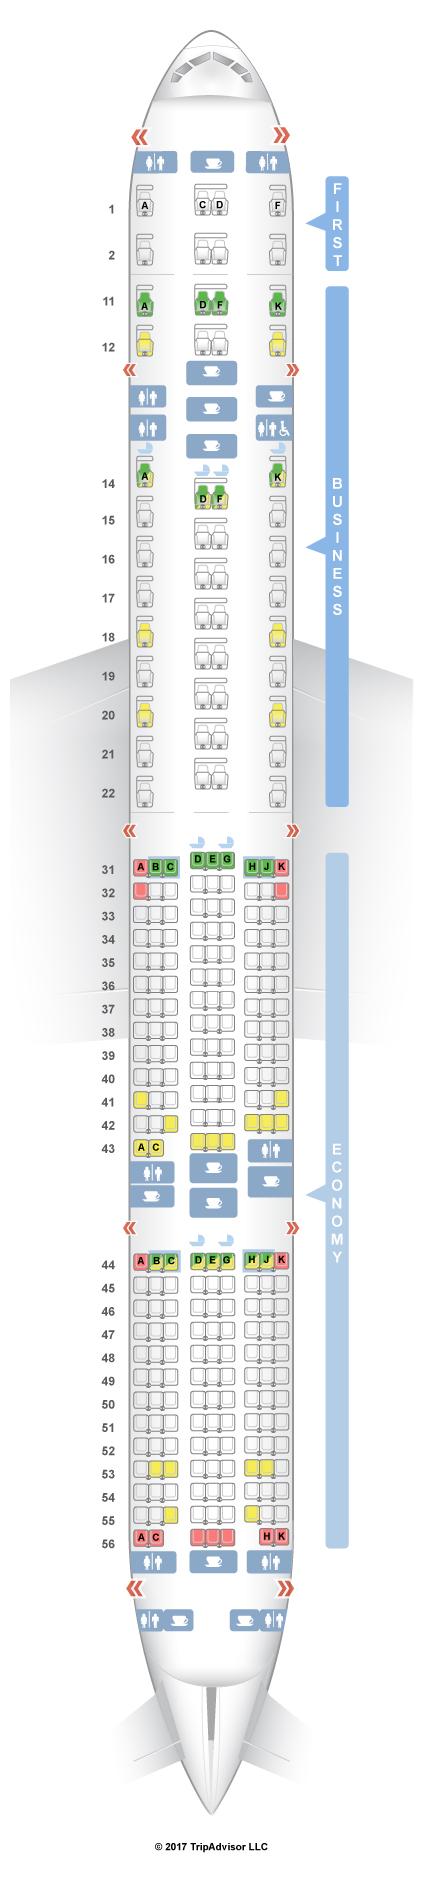 SeatGuru Seat Map Singapore Airlines Boeing 777-300ER (77W ... - photo#34